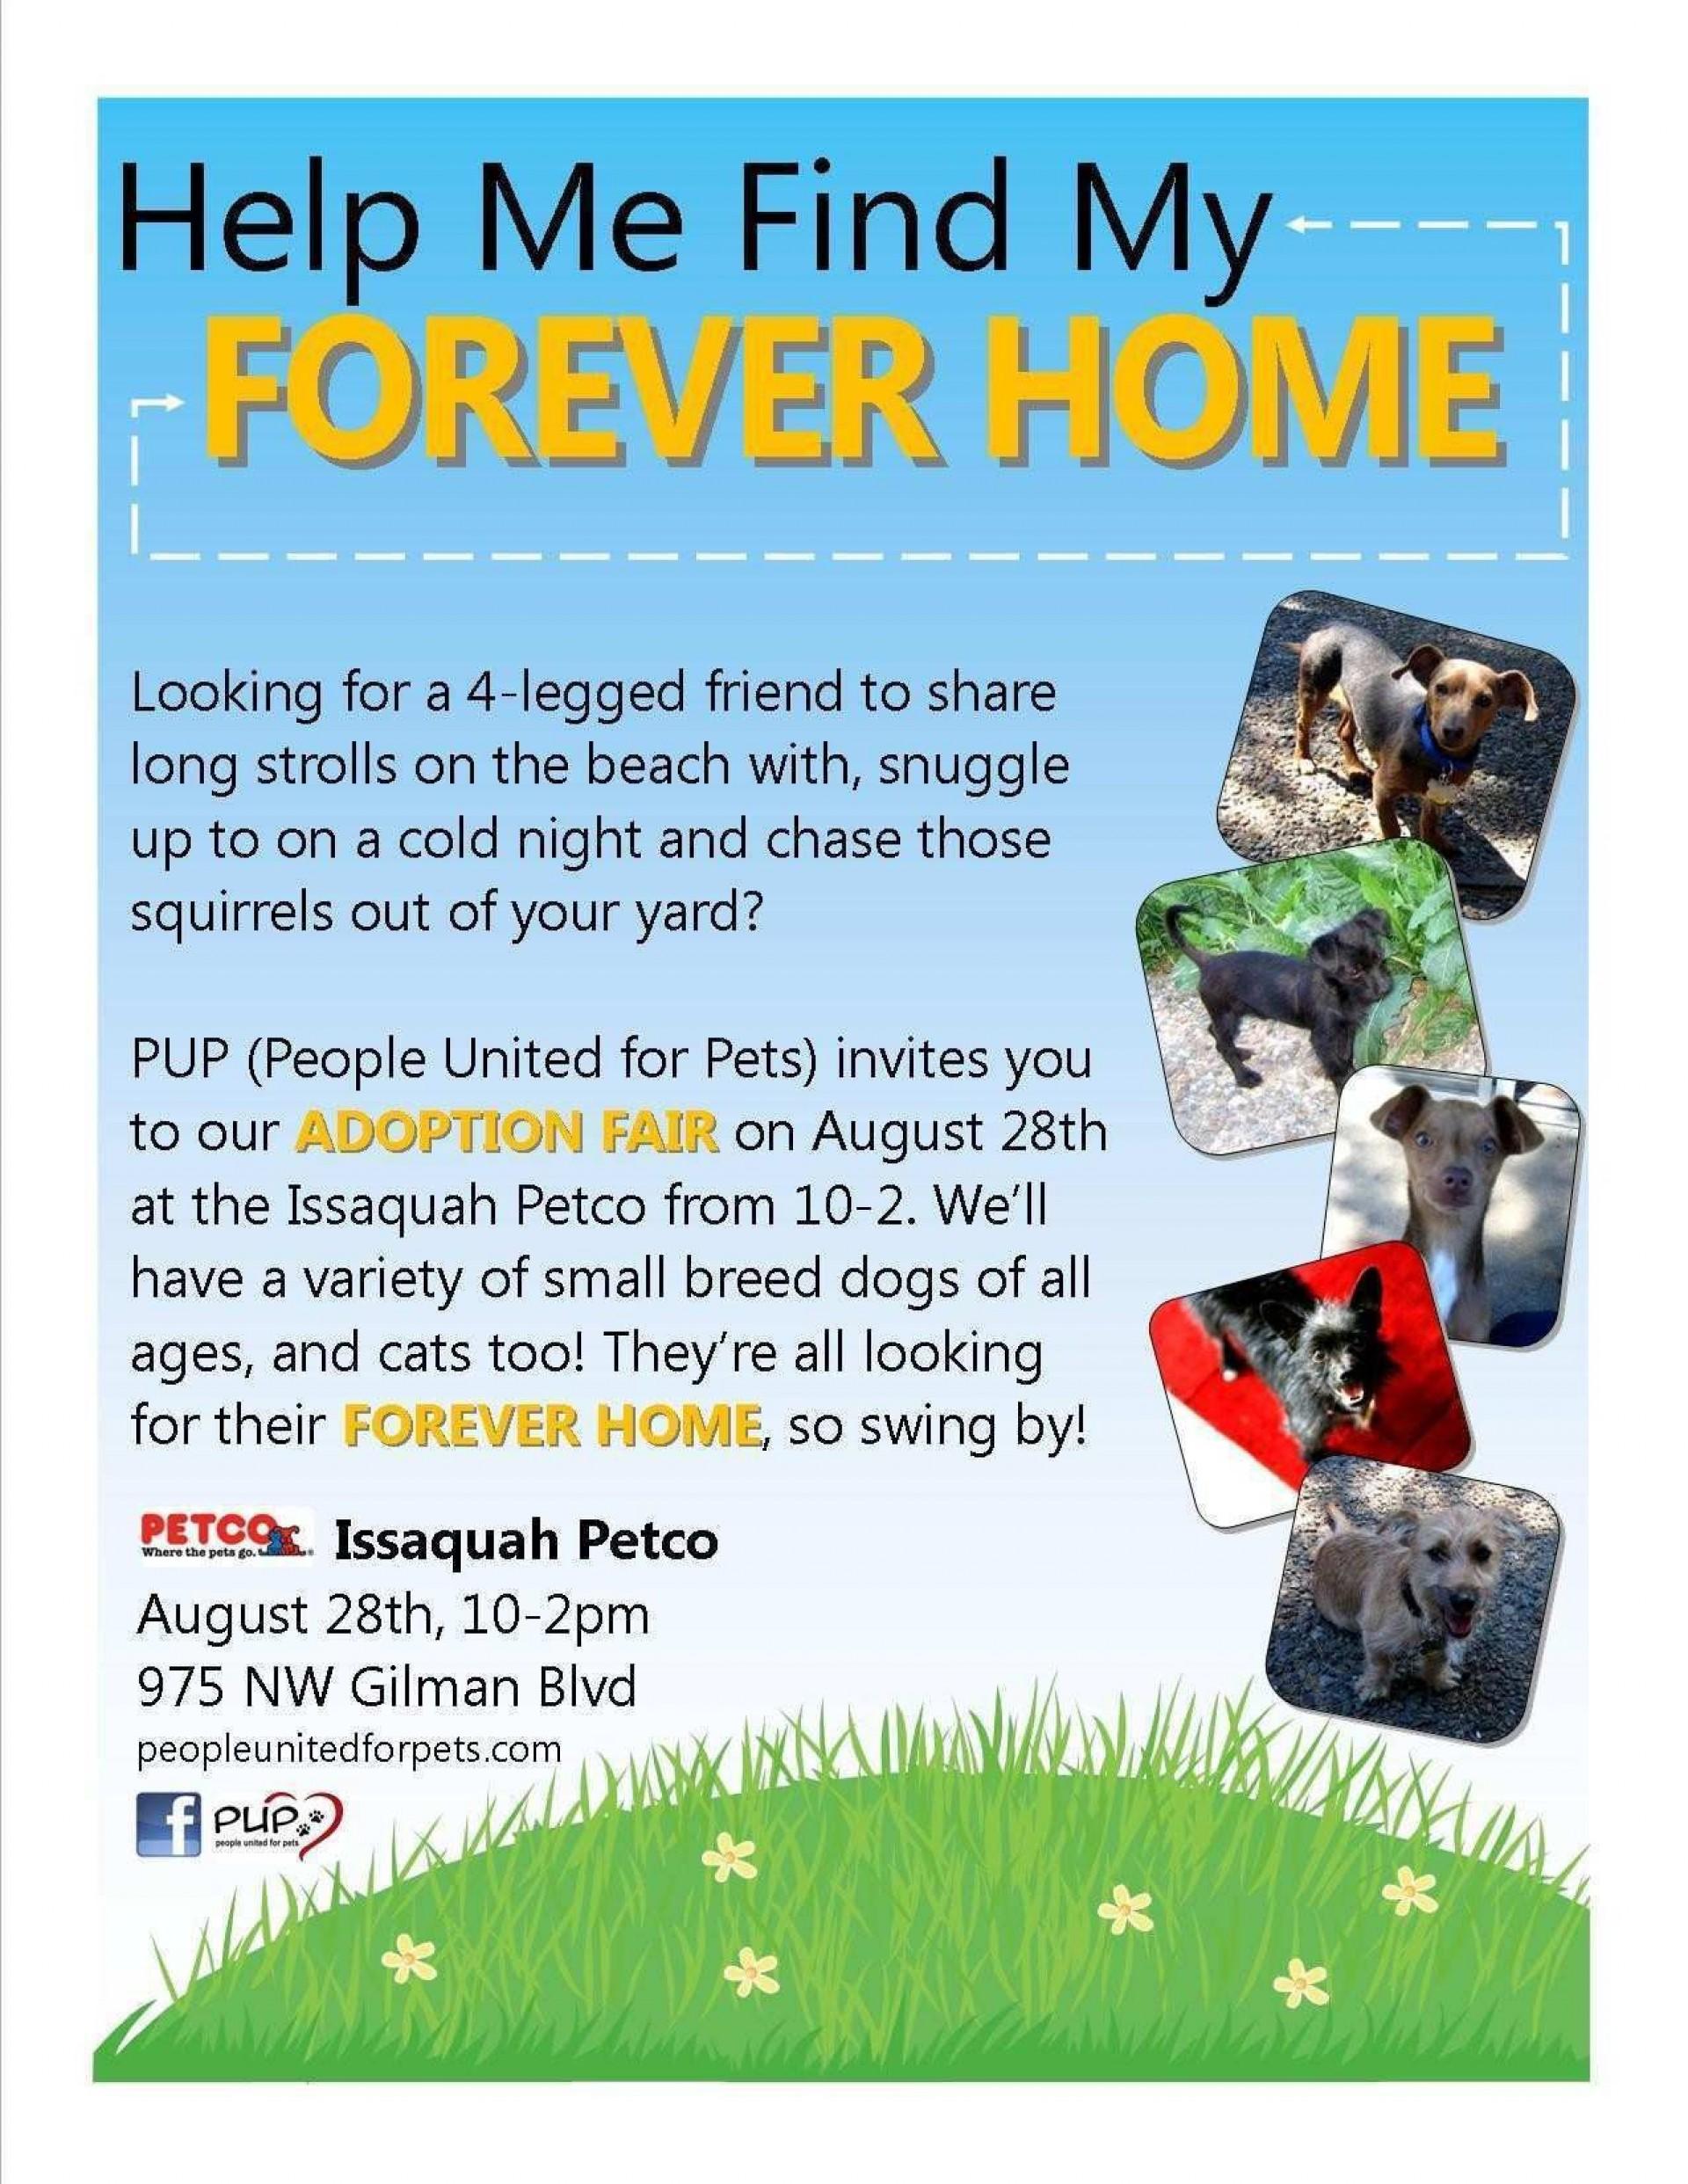 003 Phenomenal Pet Adoption Flyer Template Highest Quality  Free Event Dog1920